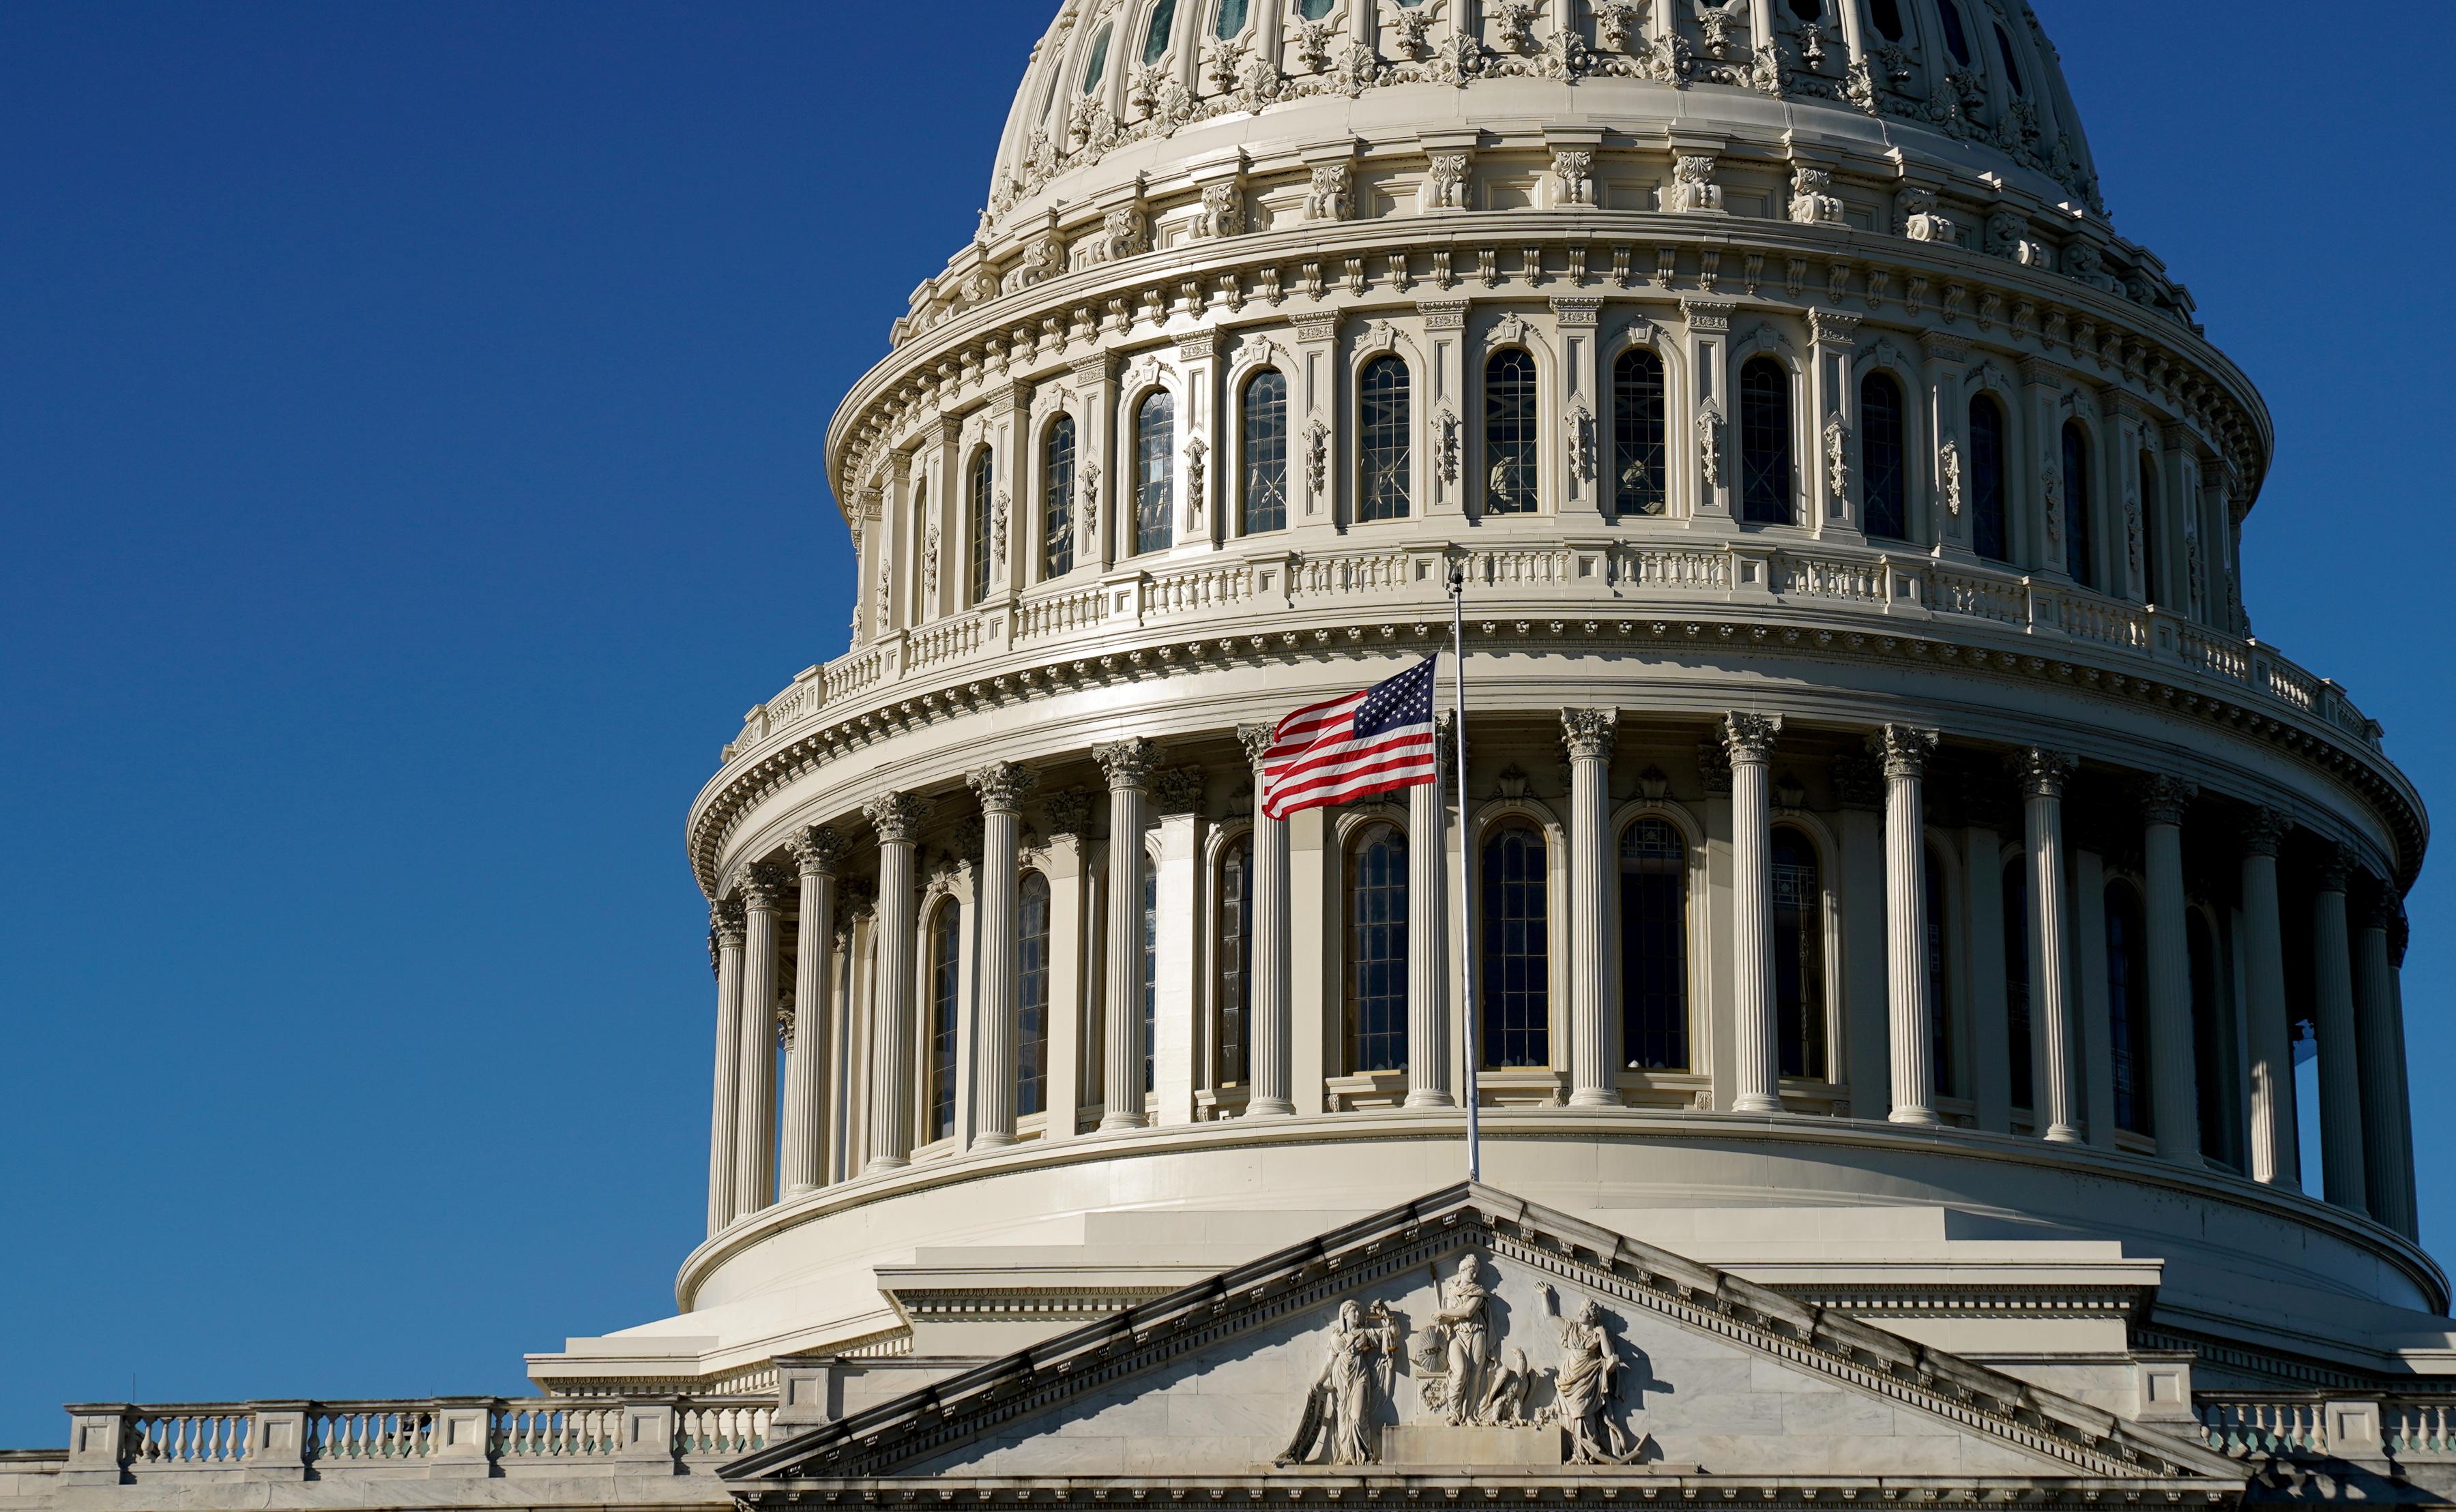 The U.S. Capitol dome is seen in Washington, U.S., December 17, 2020. REUTERS/Erin Scott/File Photo